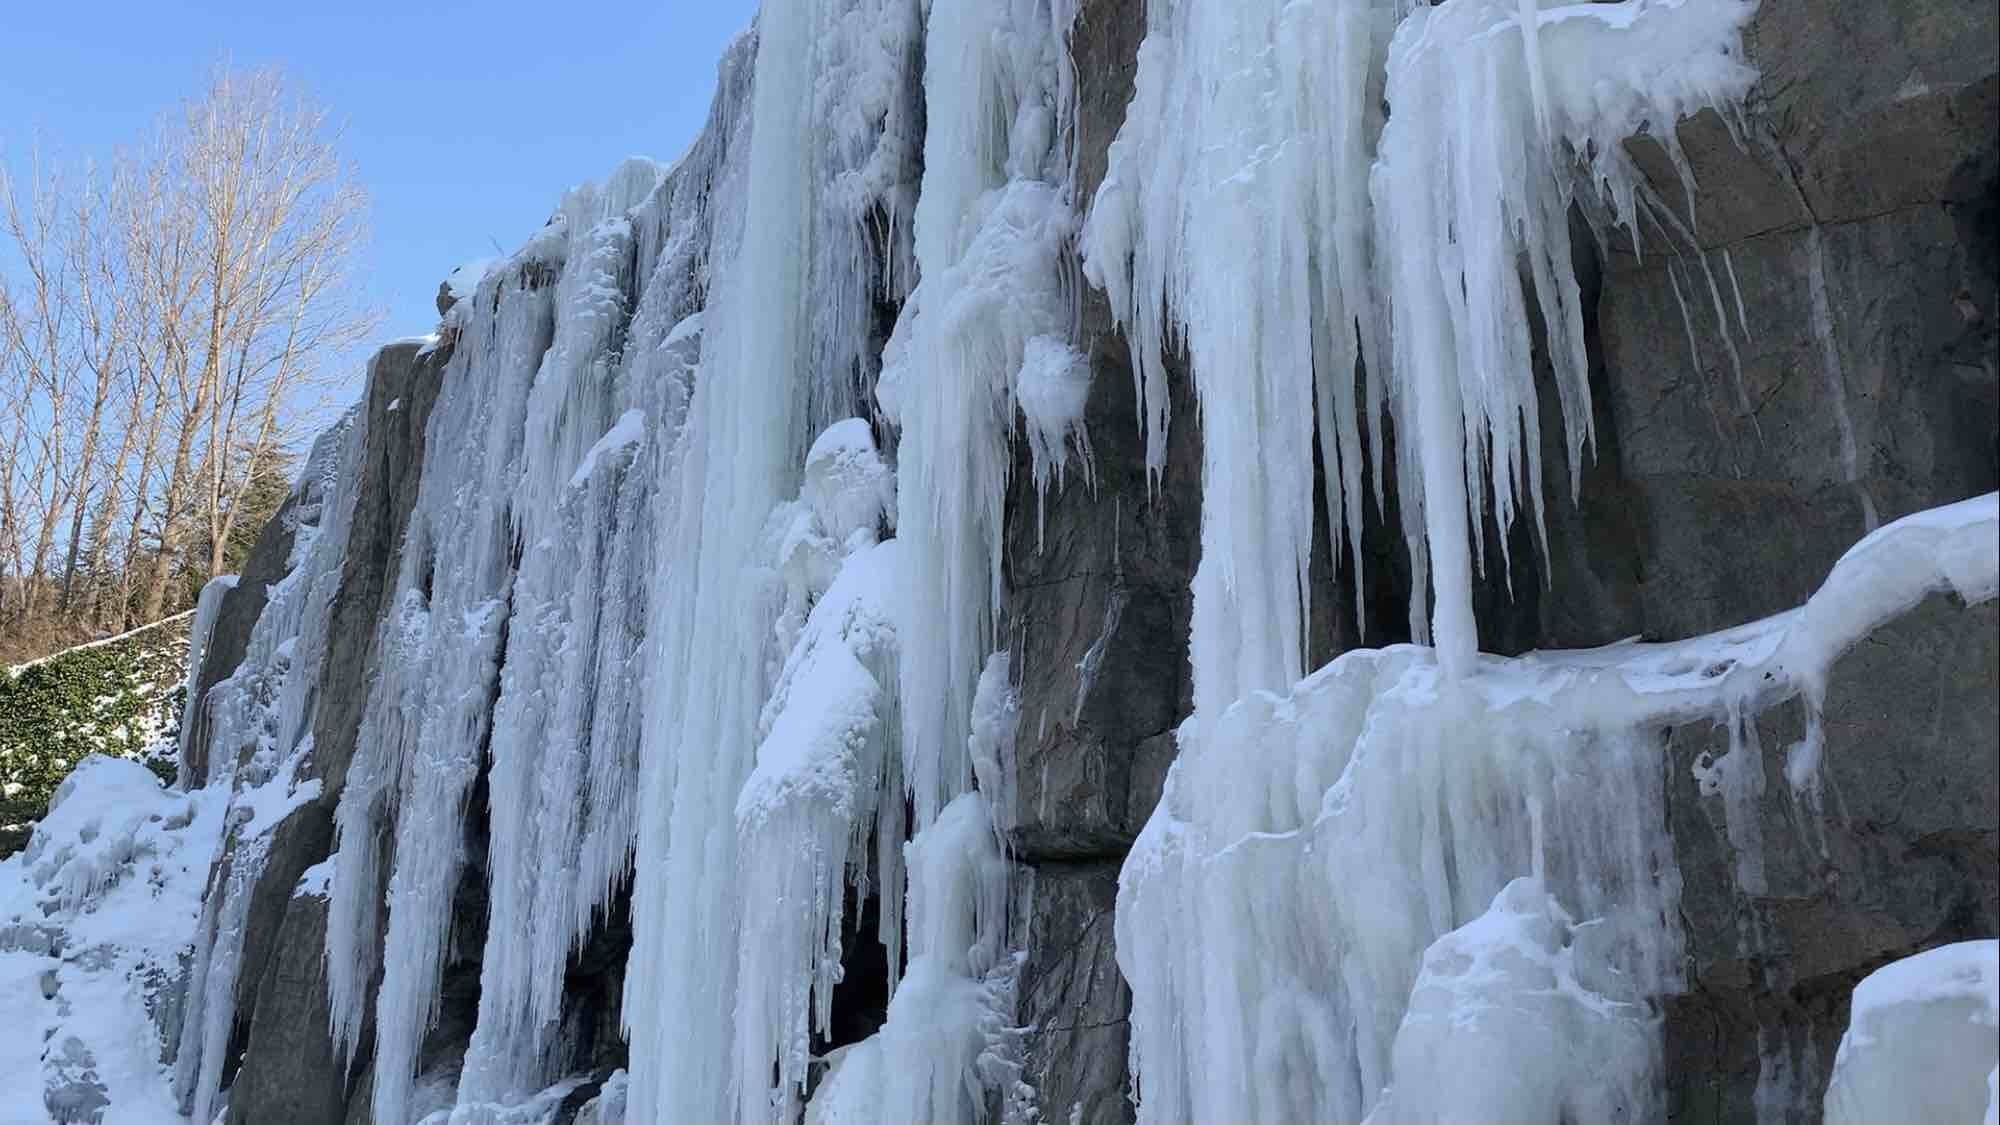 Vlog|冰瀑雪柳还有冰雕大熊 好一片琉璃世界 你确定不来看看吗?